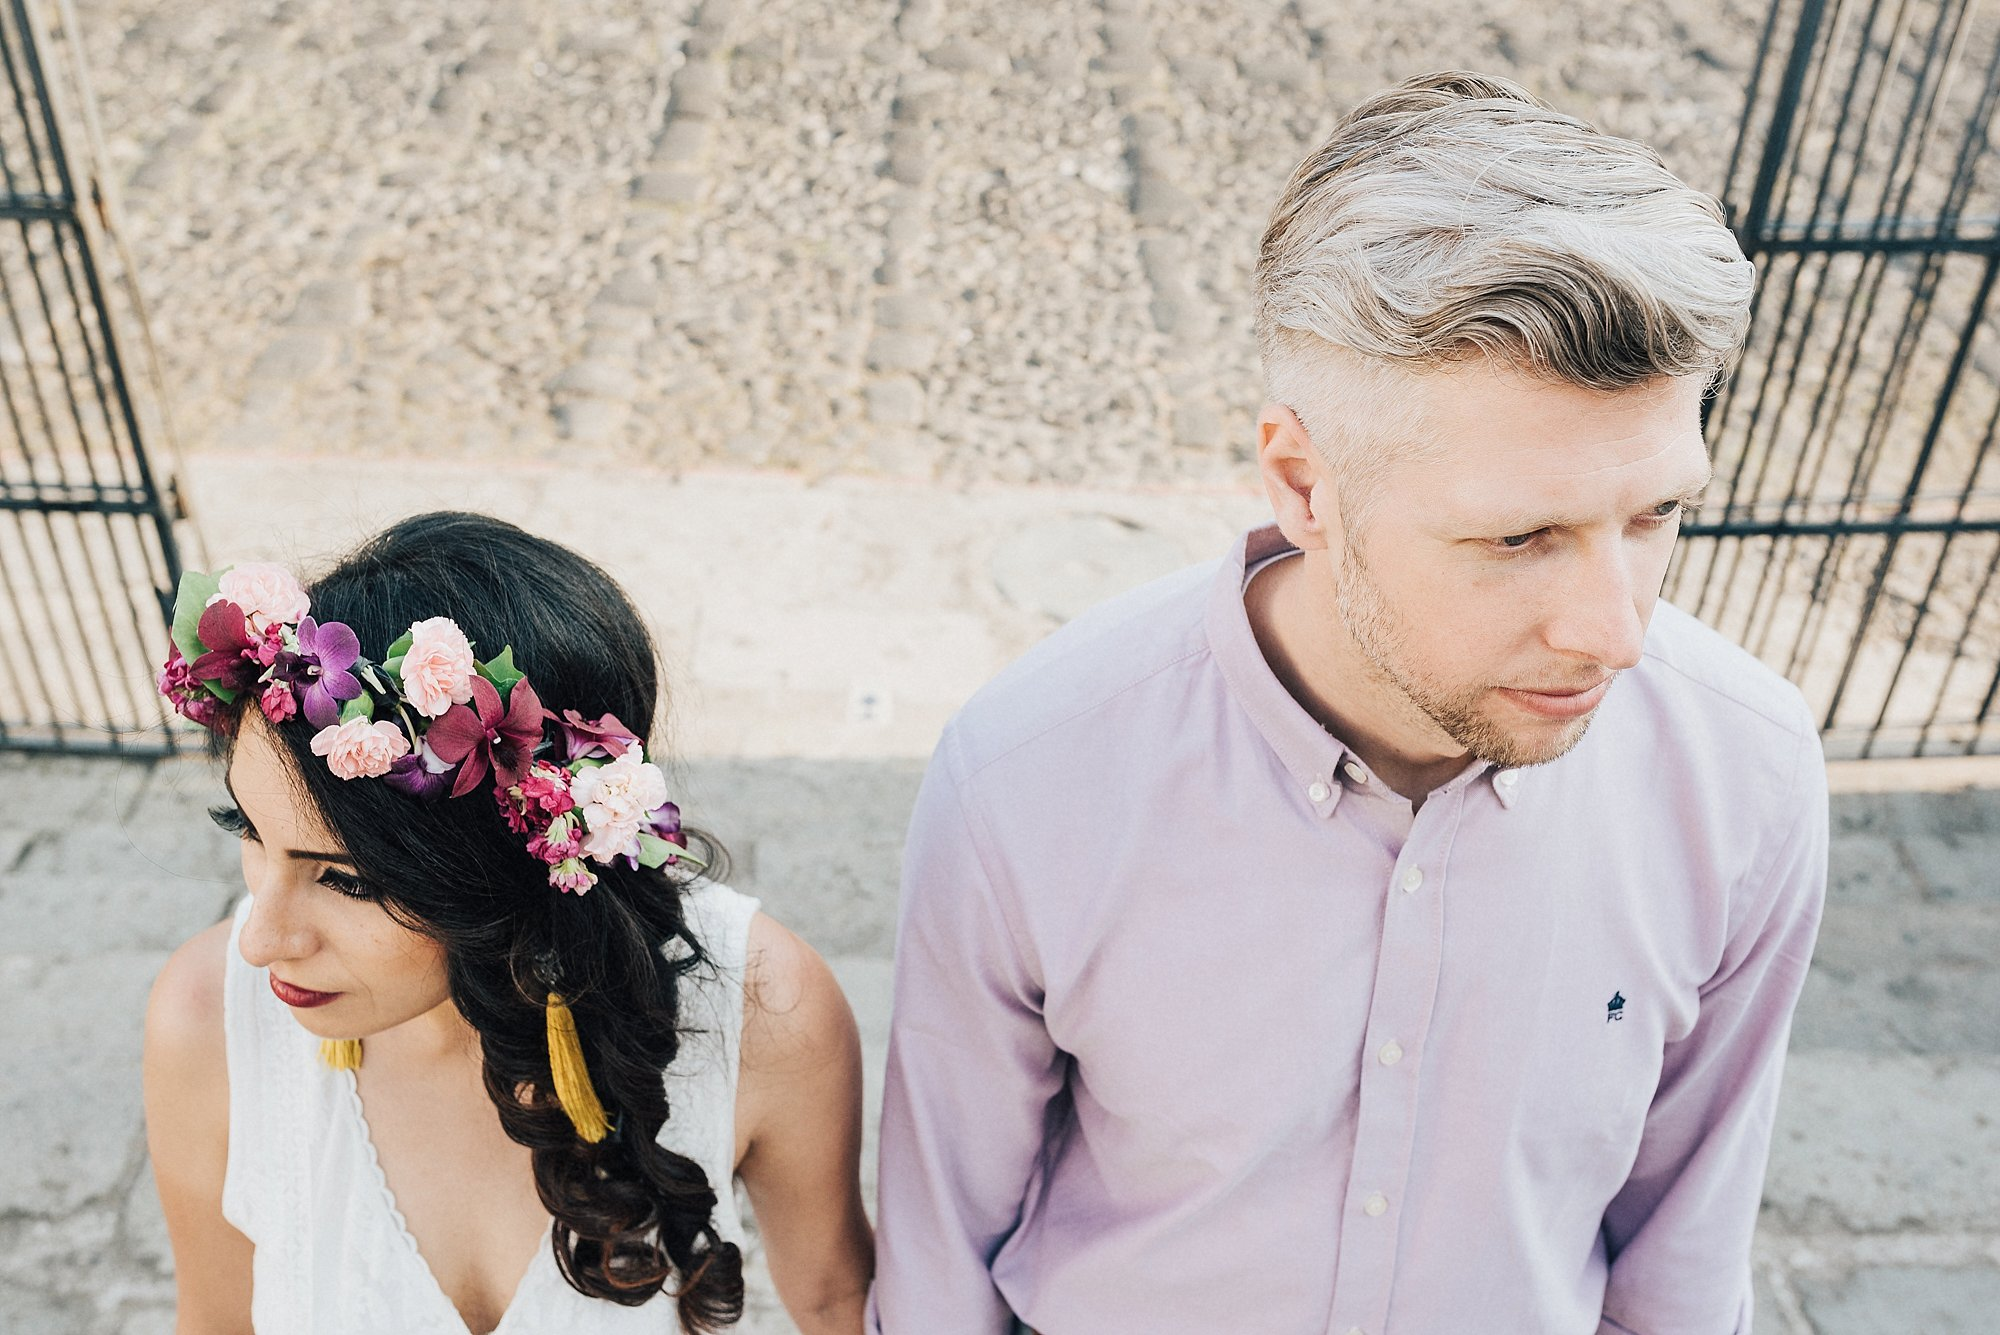 alex-yazmin-wedding-photographer-antigua-guatemala-021